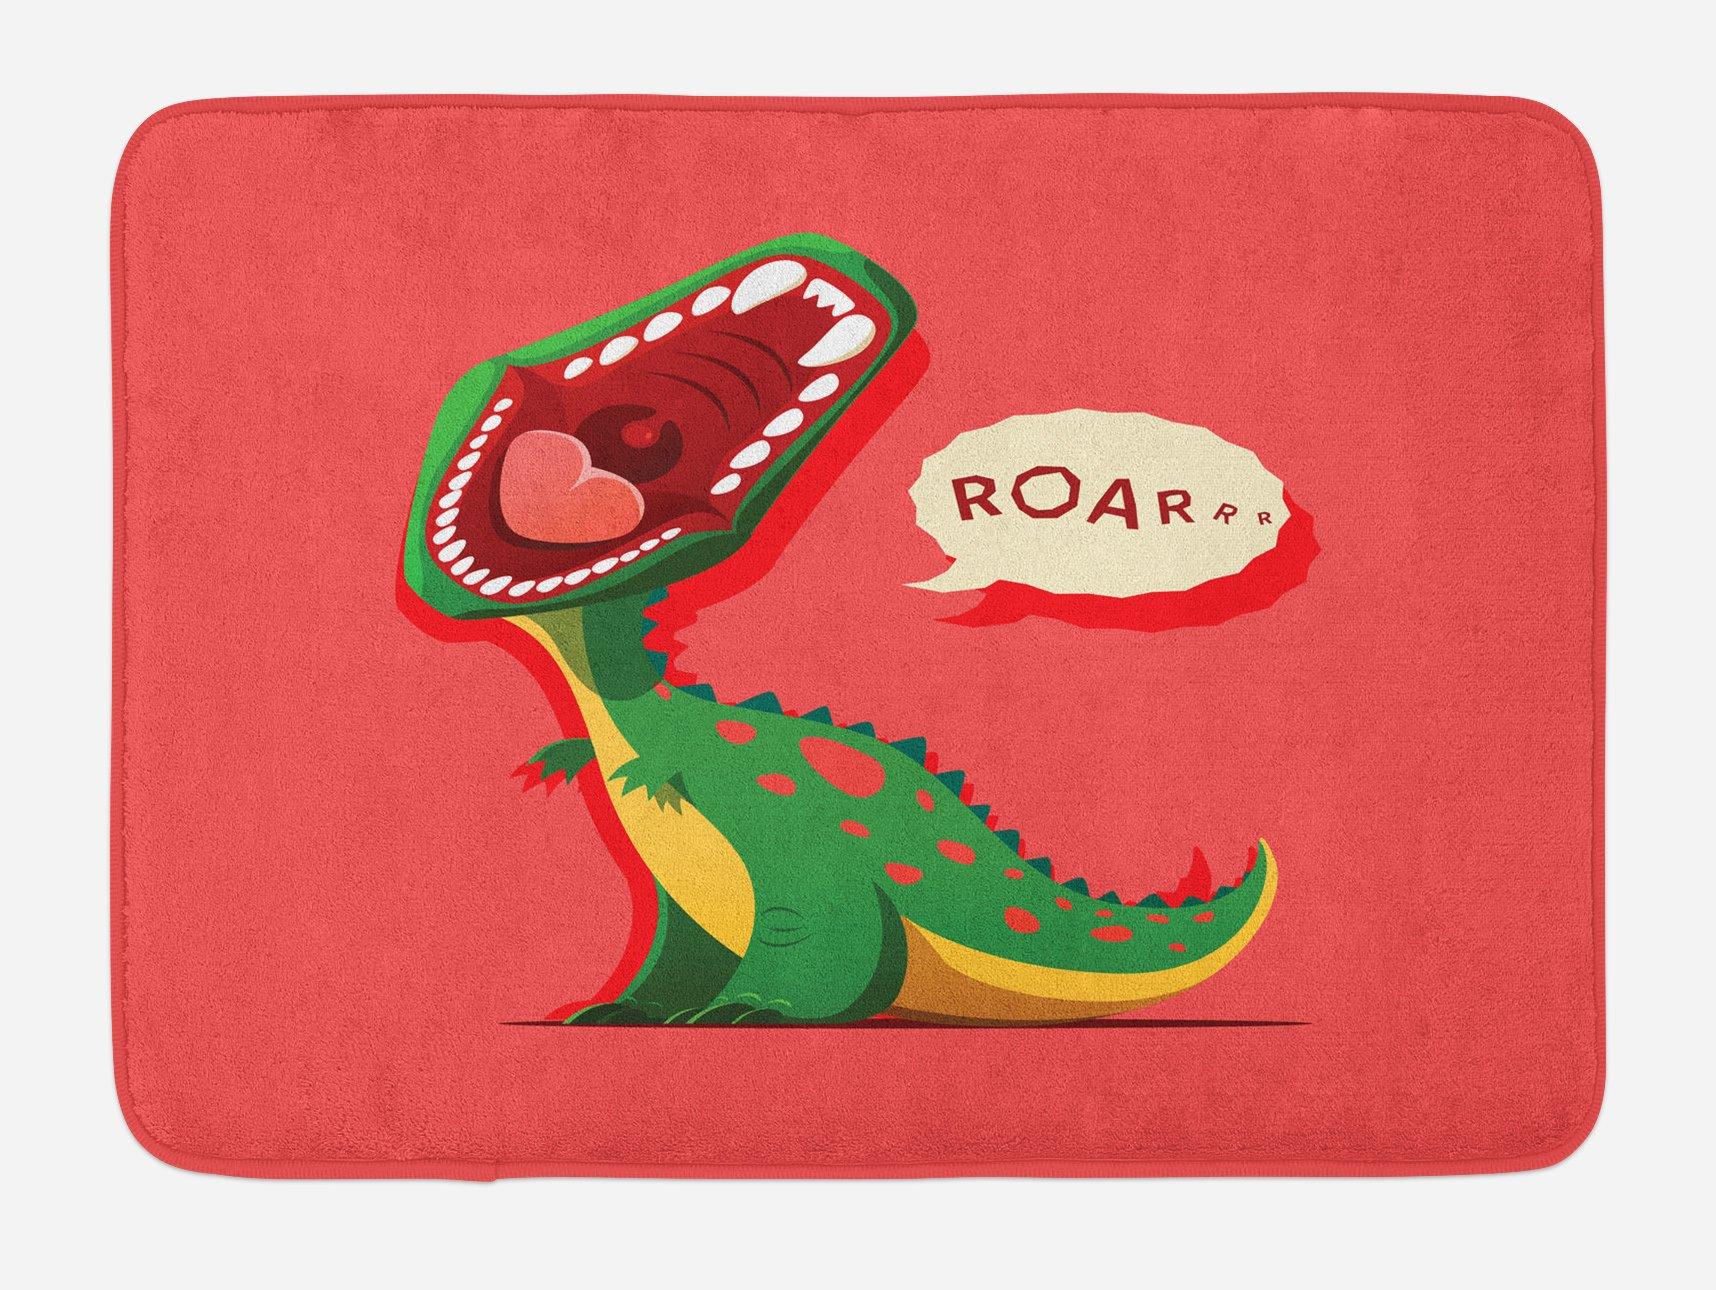 Ambesonne Dinosaur Bath Mat, Aggressive Prehistoric Cartoon Animal Roaring Open Mouth Wildlife Image, Plush Bathroom Decor Mat with Non Slip Backing, 29.5 W X 17.5 W Inches, Coral Green Yellow